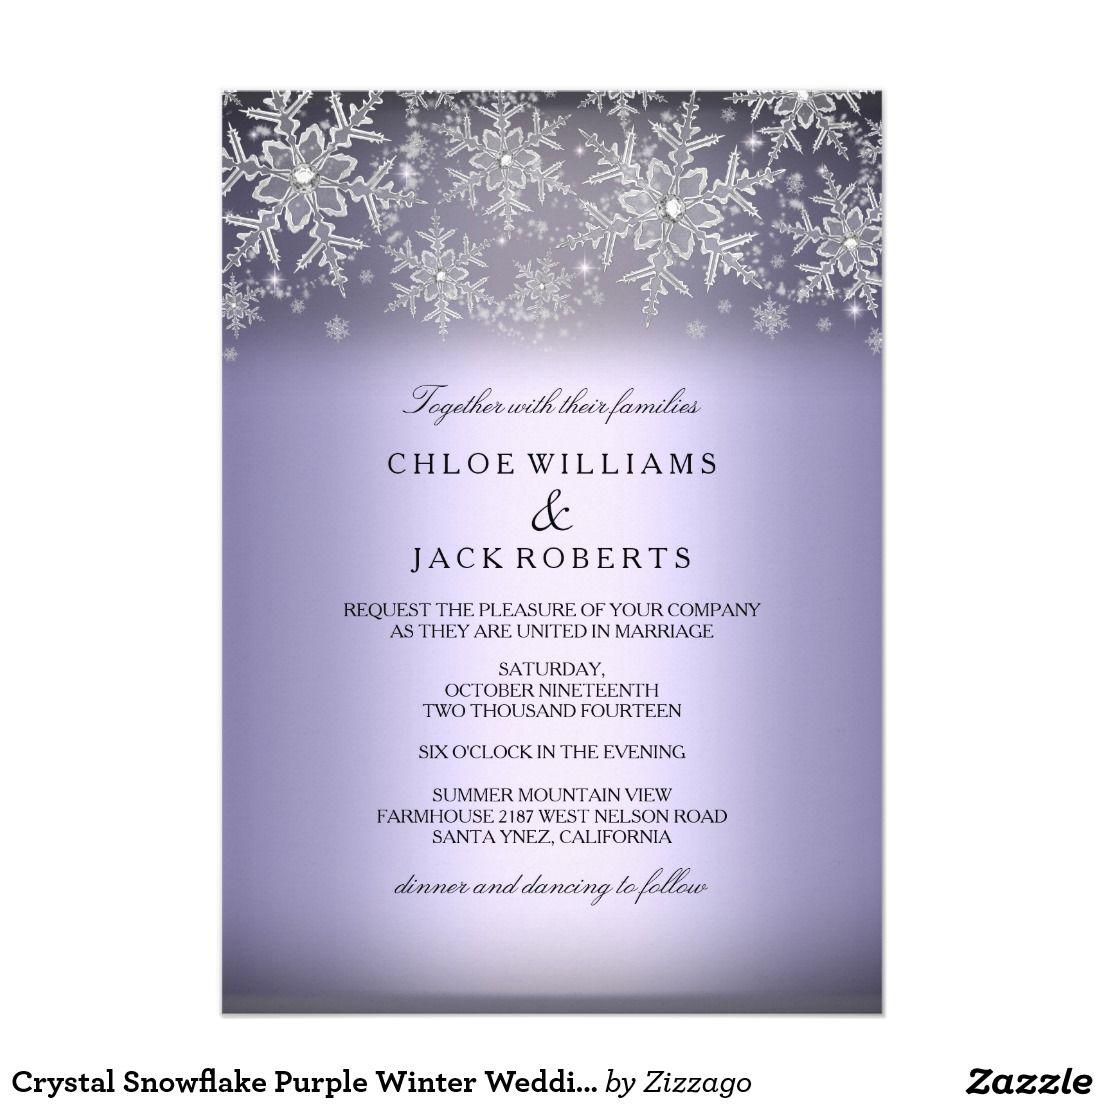 Strings Quotes Wallpaper Crystal Snowflake Purple Winter Wedding Invitation